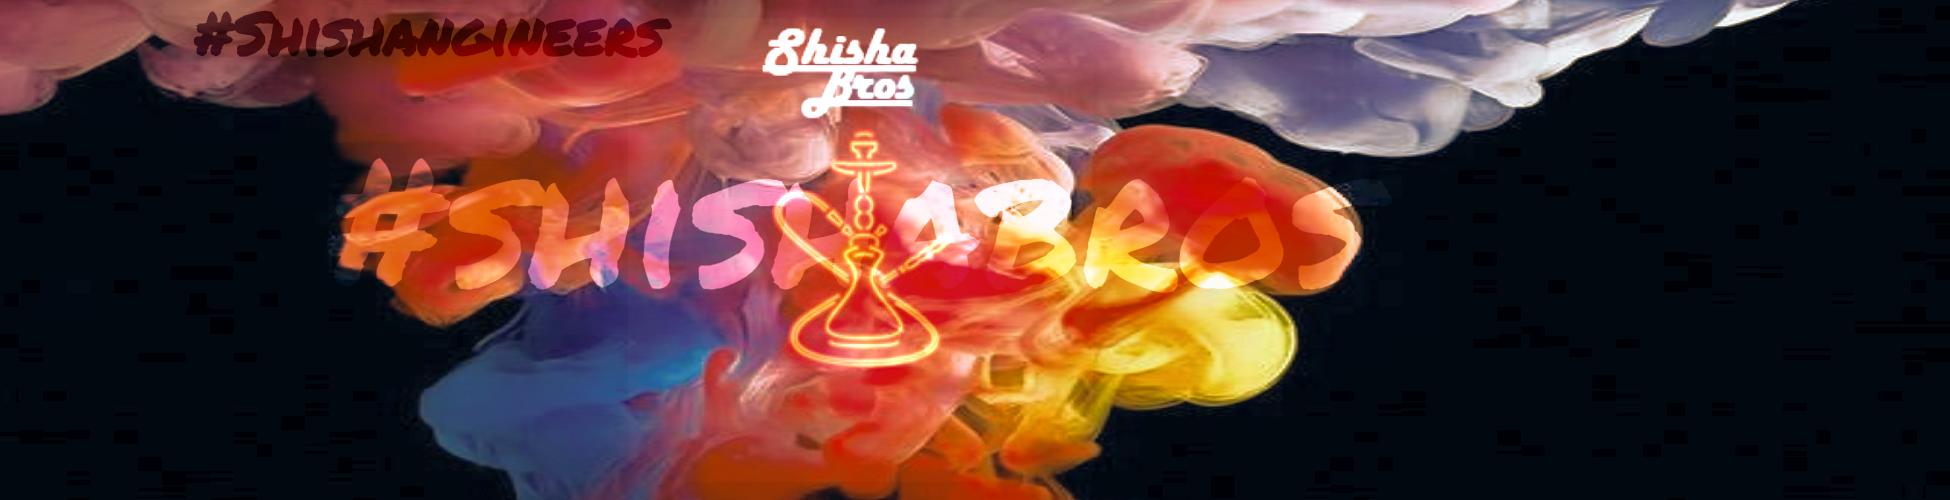 Shisha-Bros-Main-Head